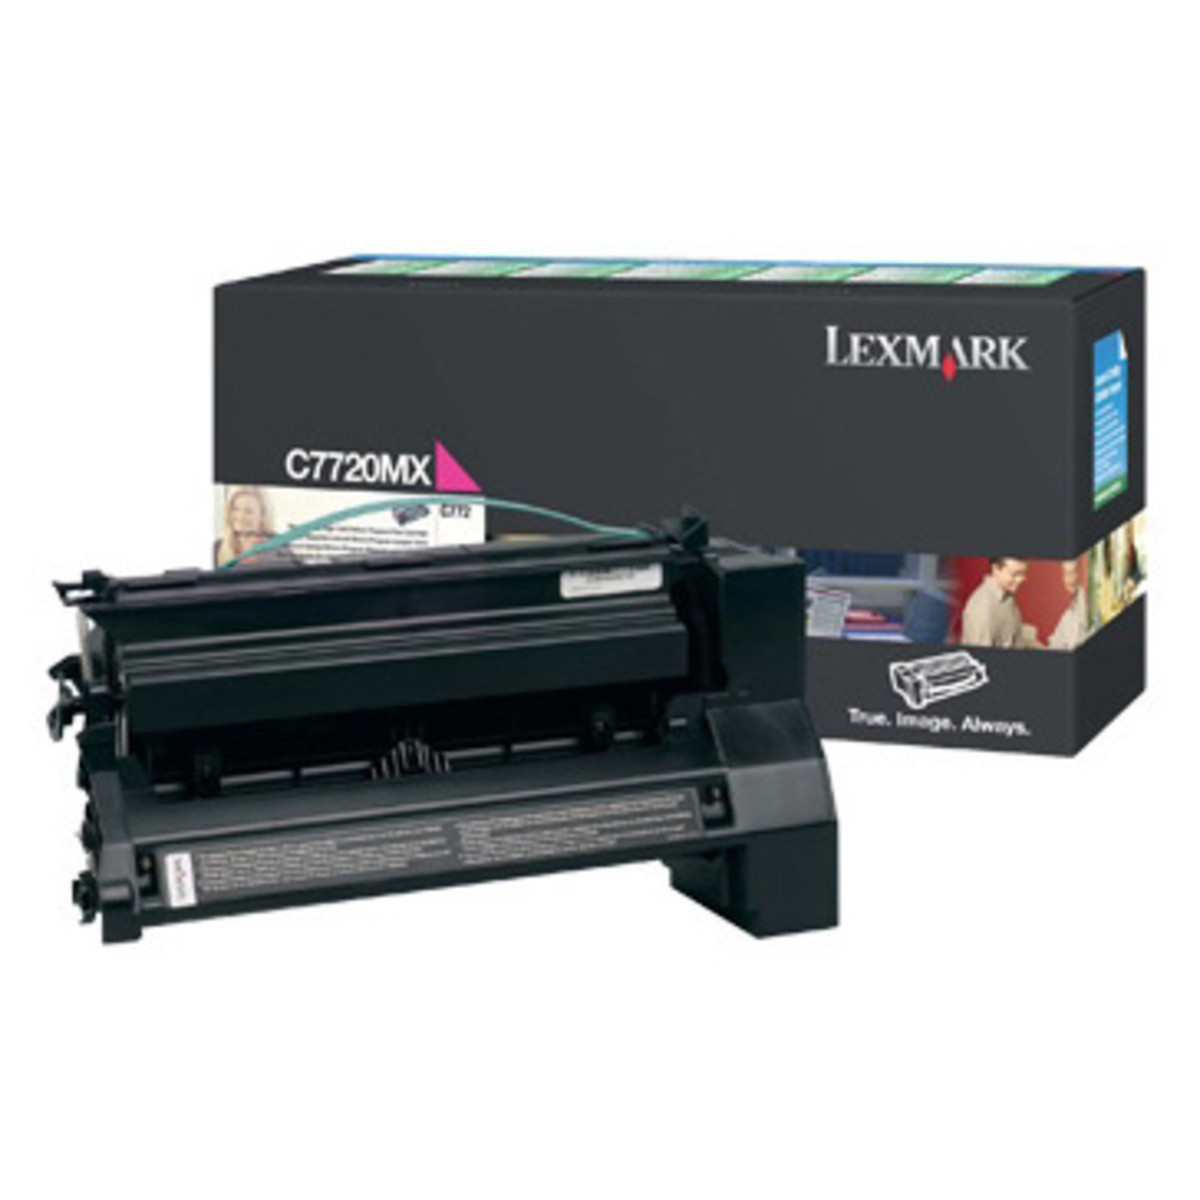 Lexmark C7720MX Magenta Toner Cartridge High Yield